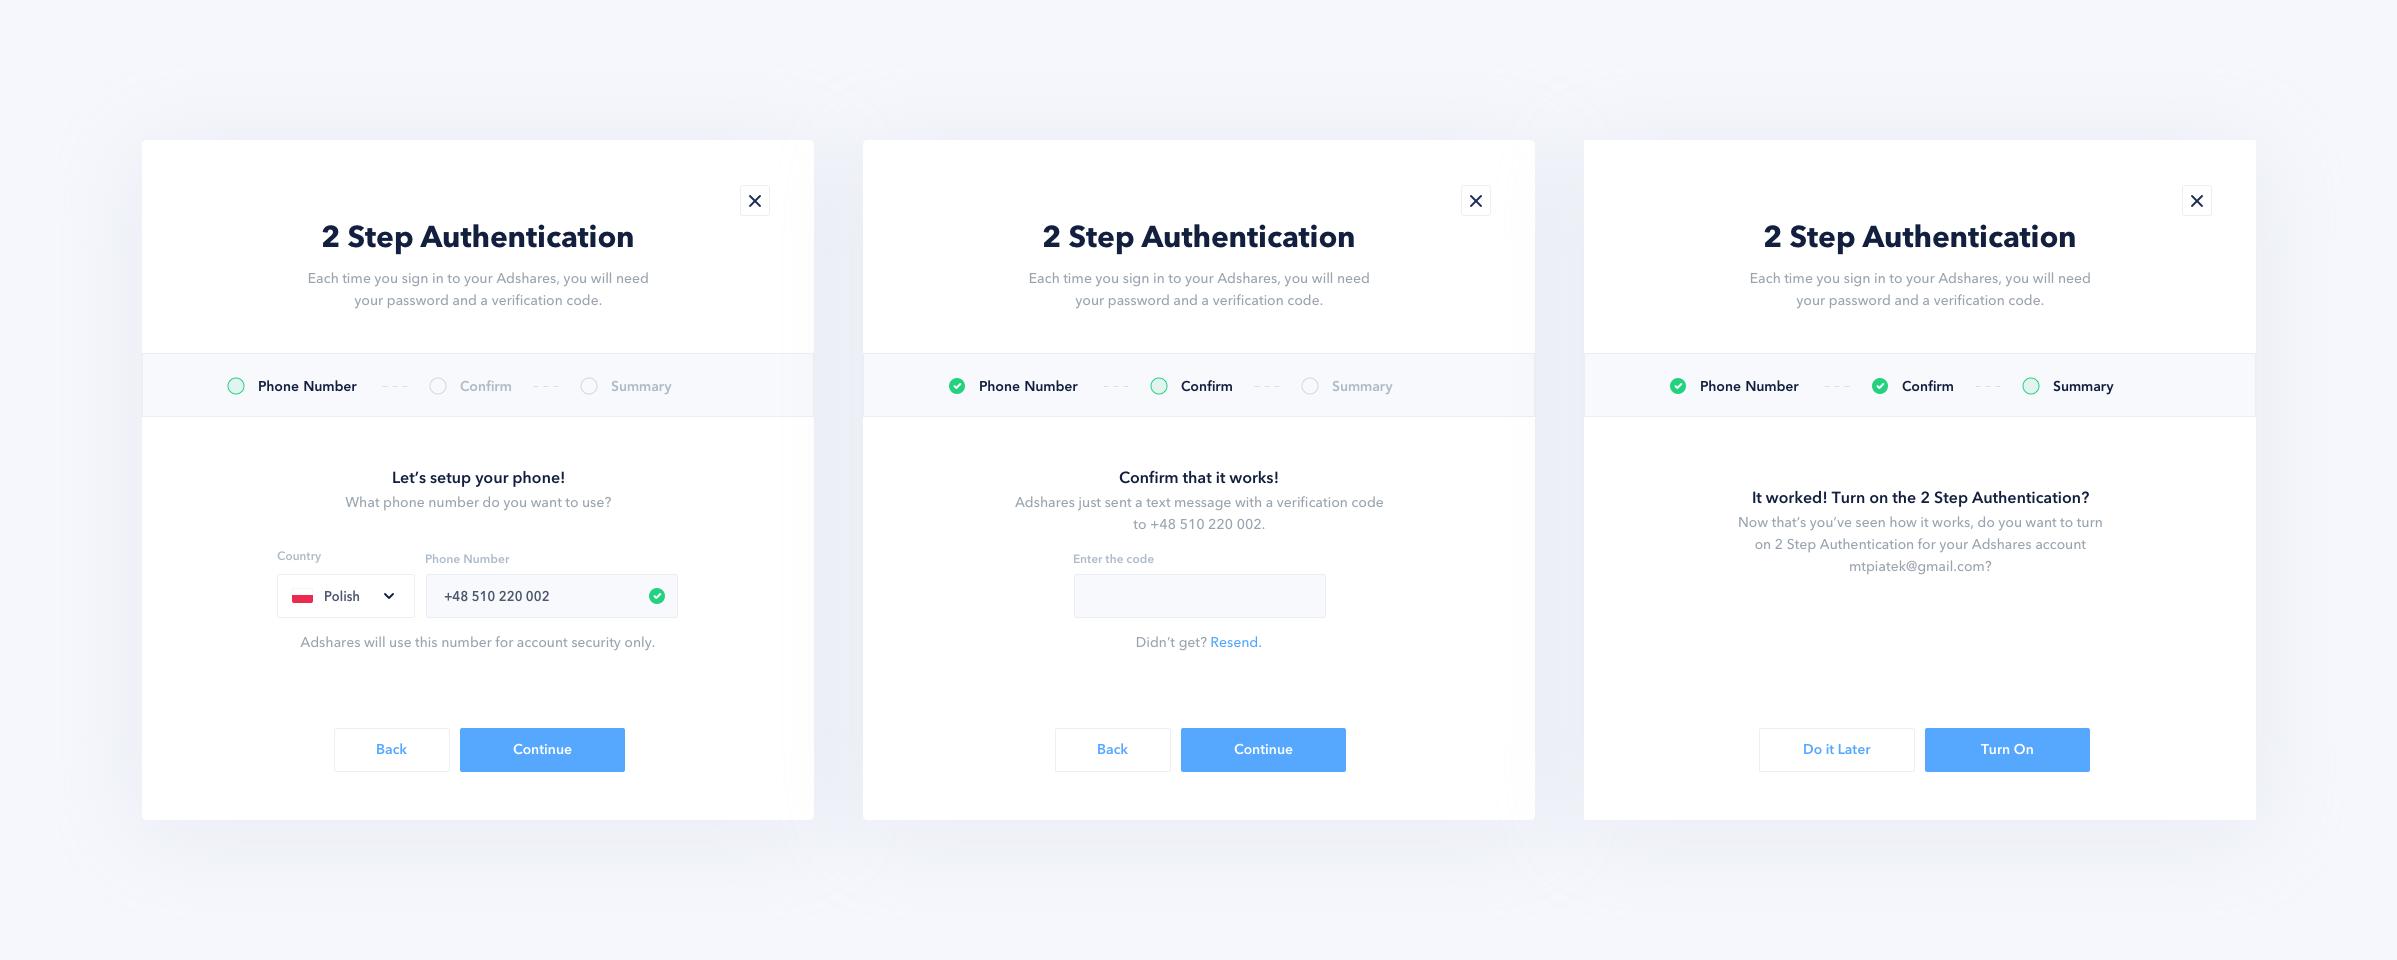 2 Step Authentication Steps Web Web Design 2 Step